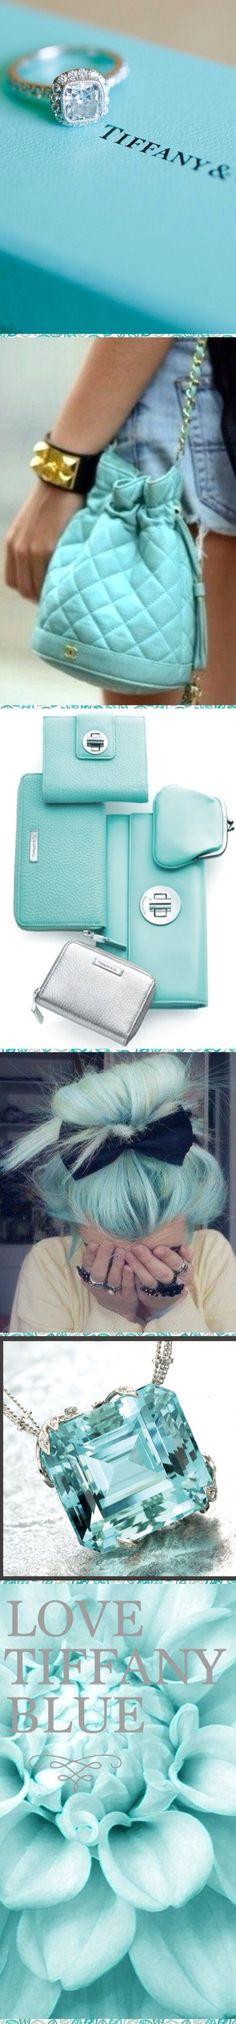 Luxury in Tiffany Blue@Luxurydotcom/